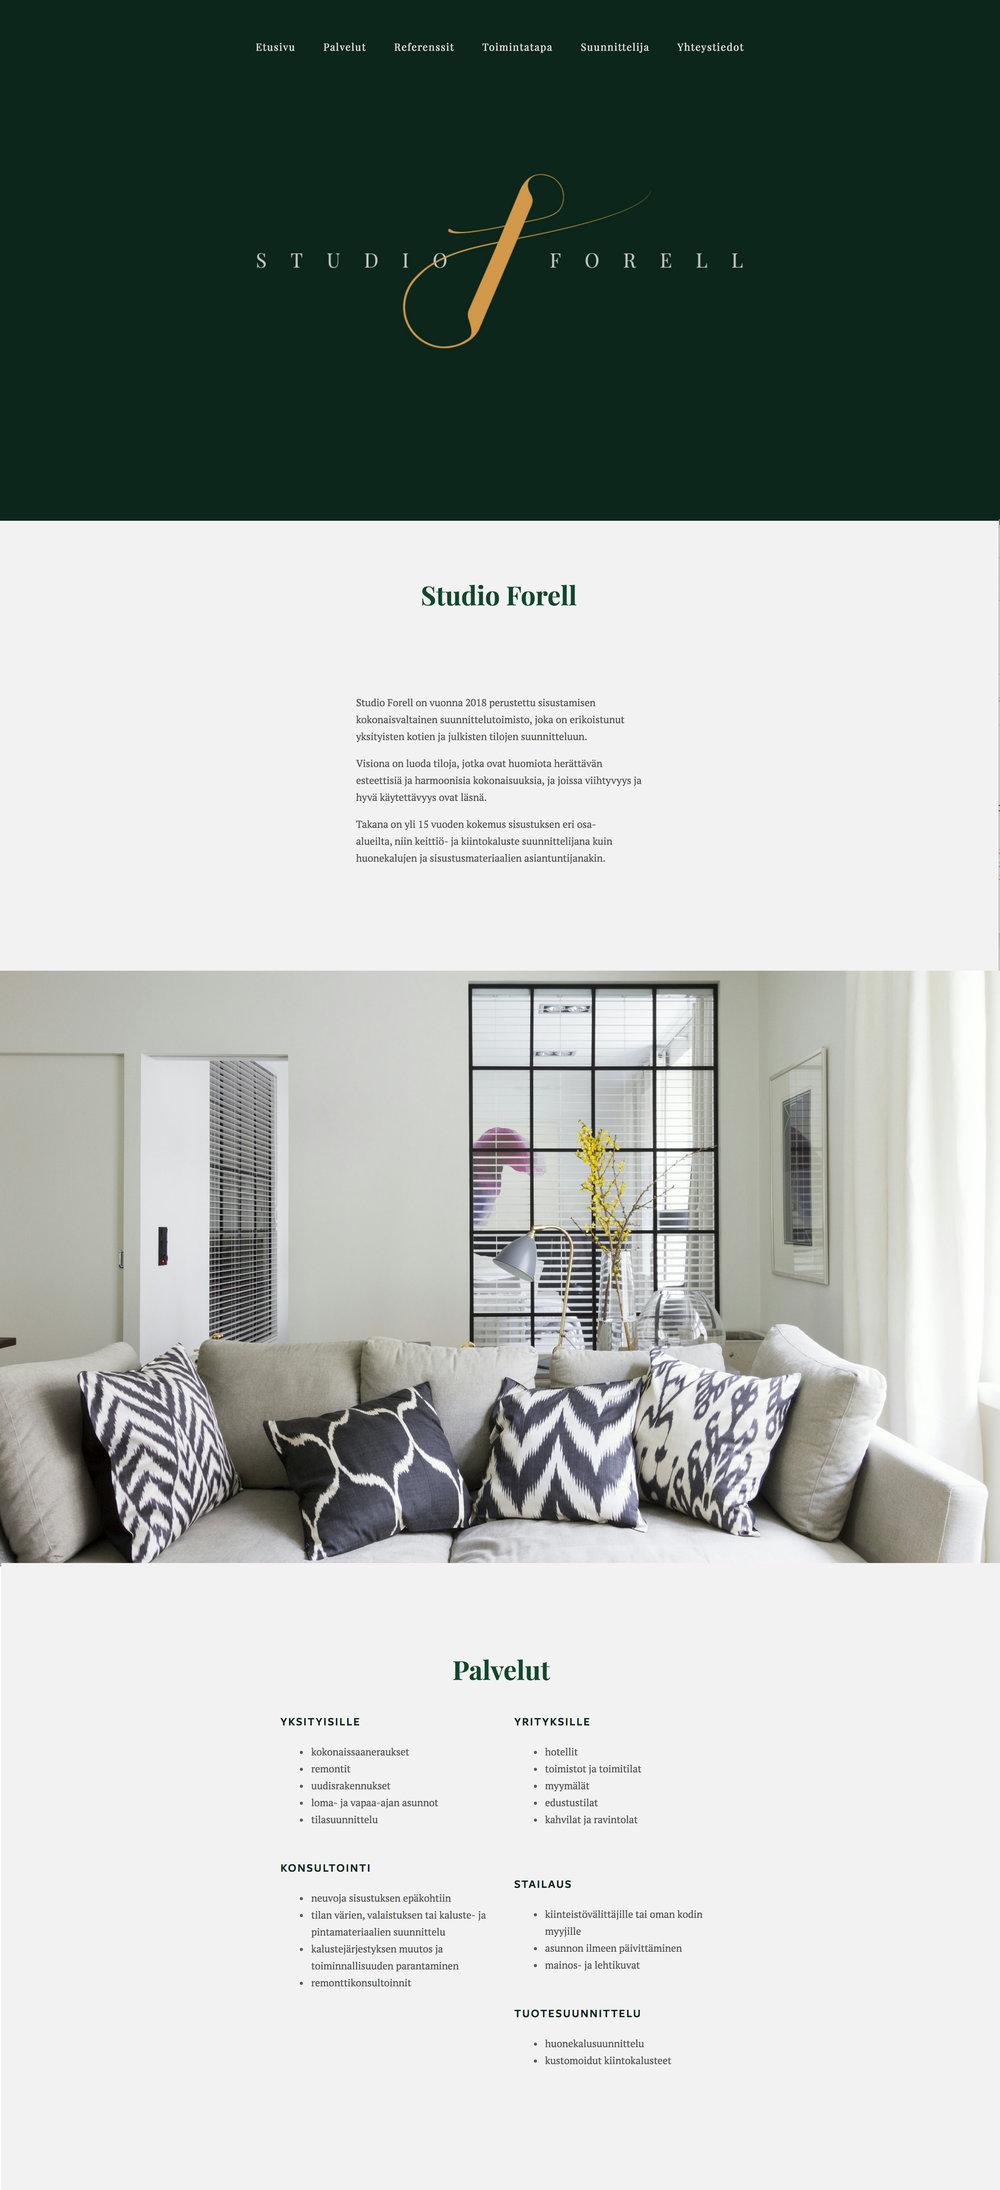 StudioForell_webpage.jpg